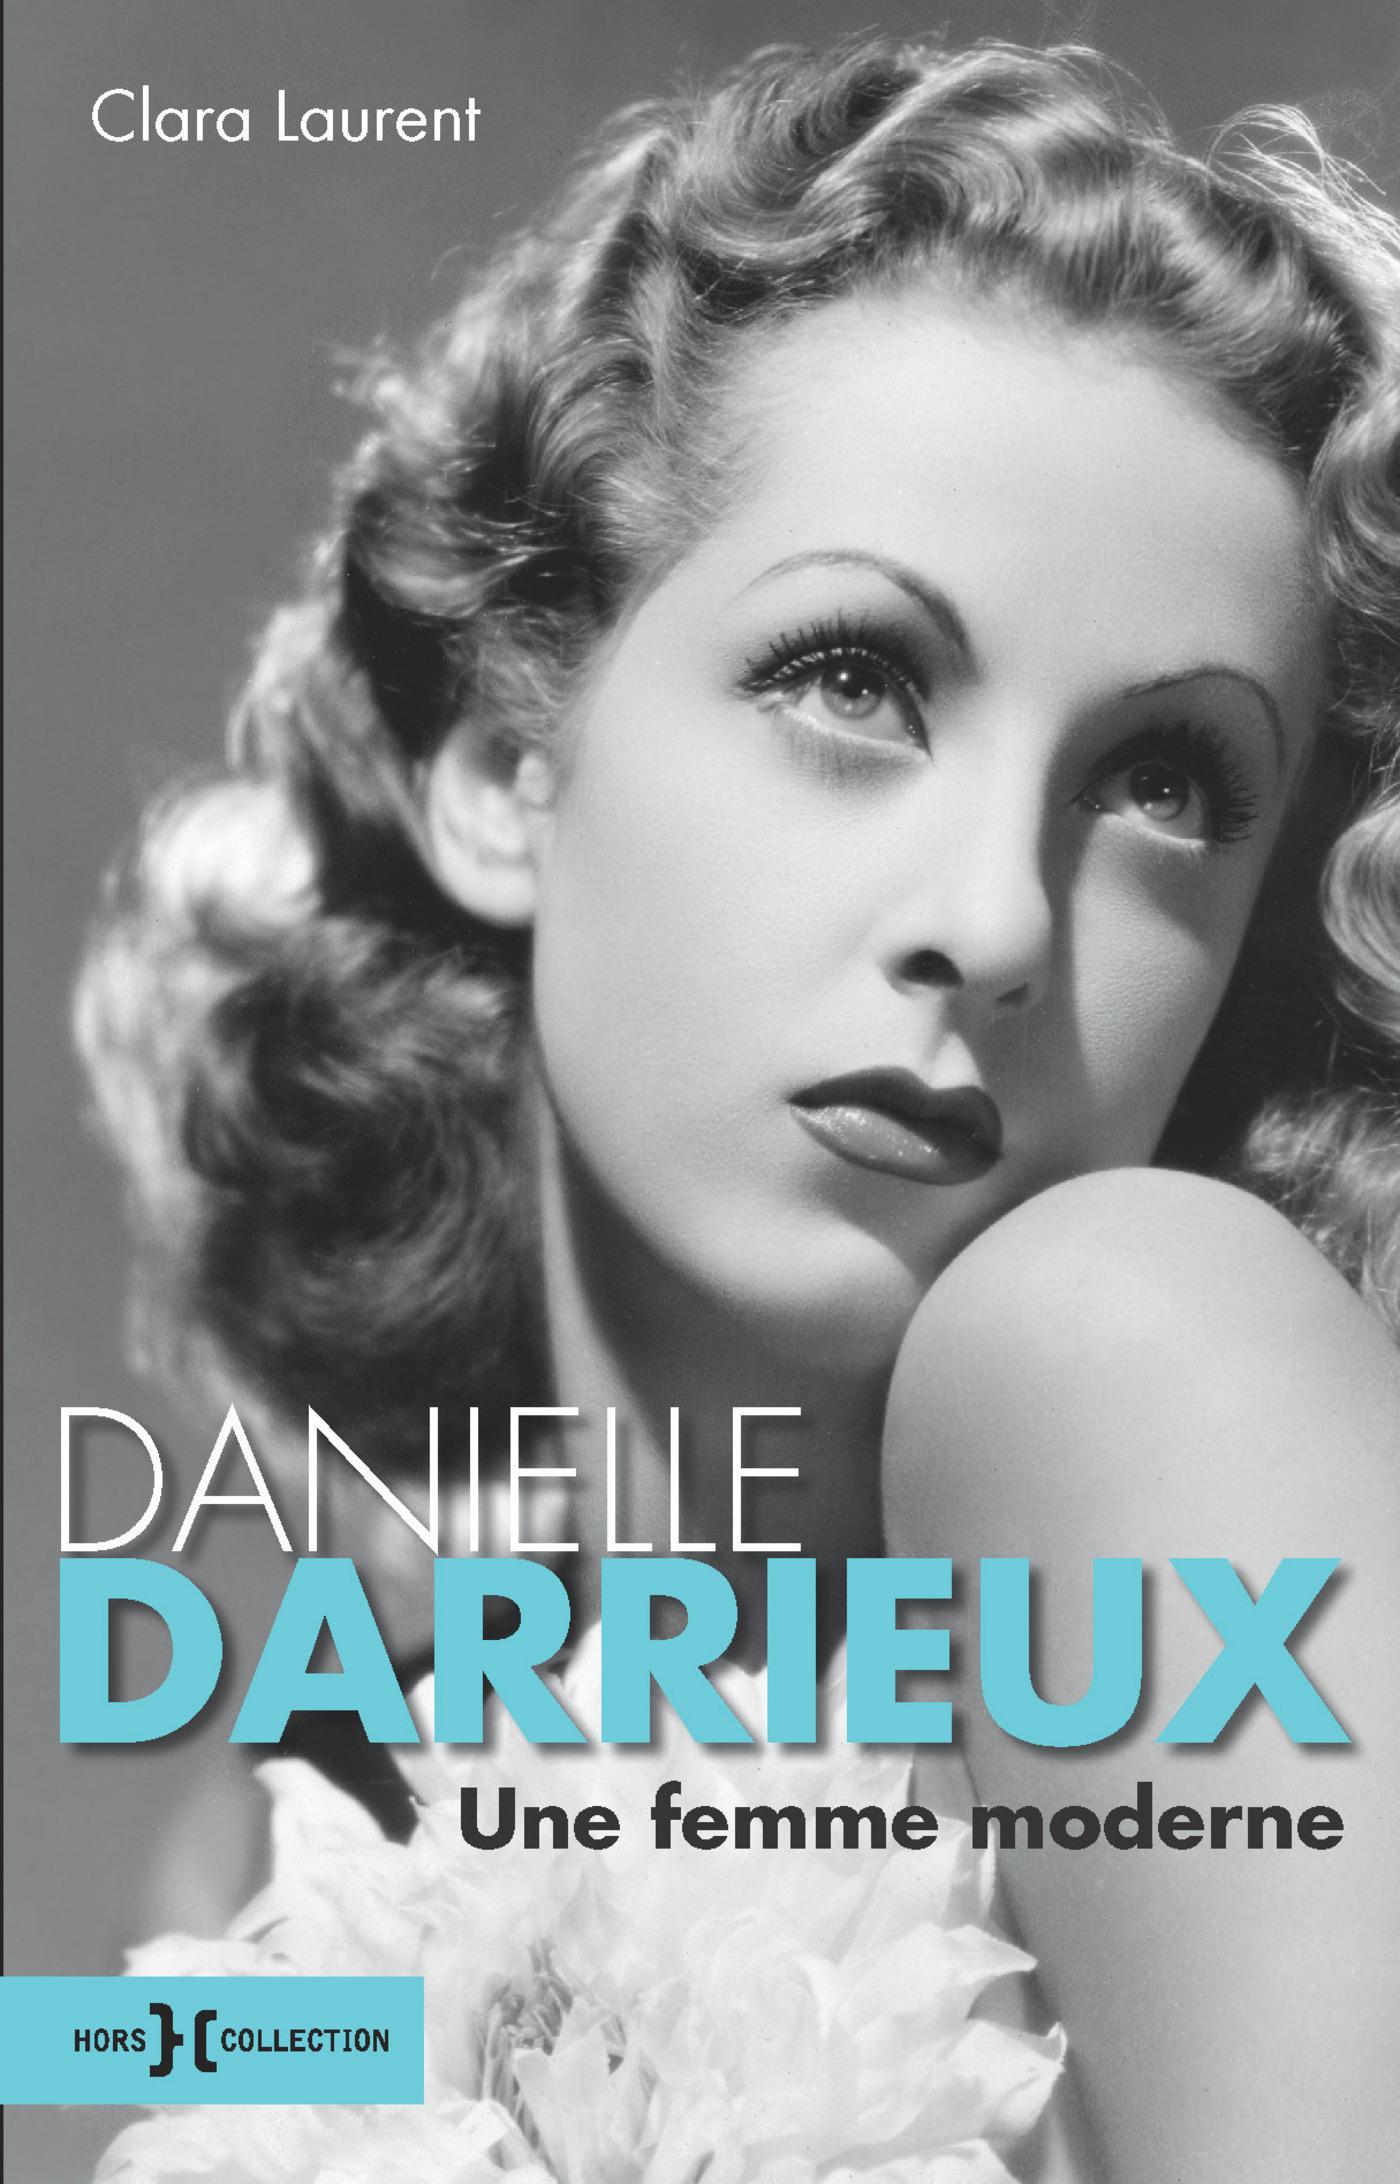 Danielle Darrieux, une femme moderne | LAURENT, Clara